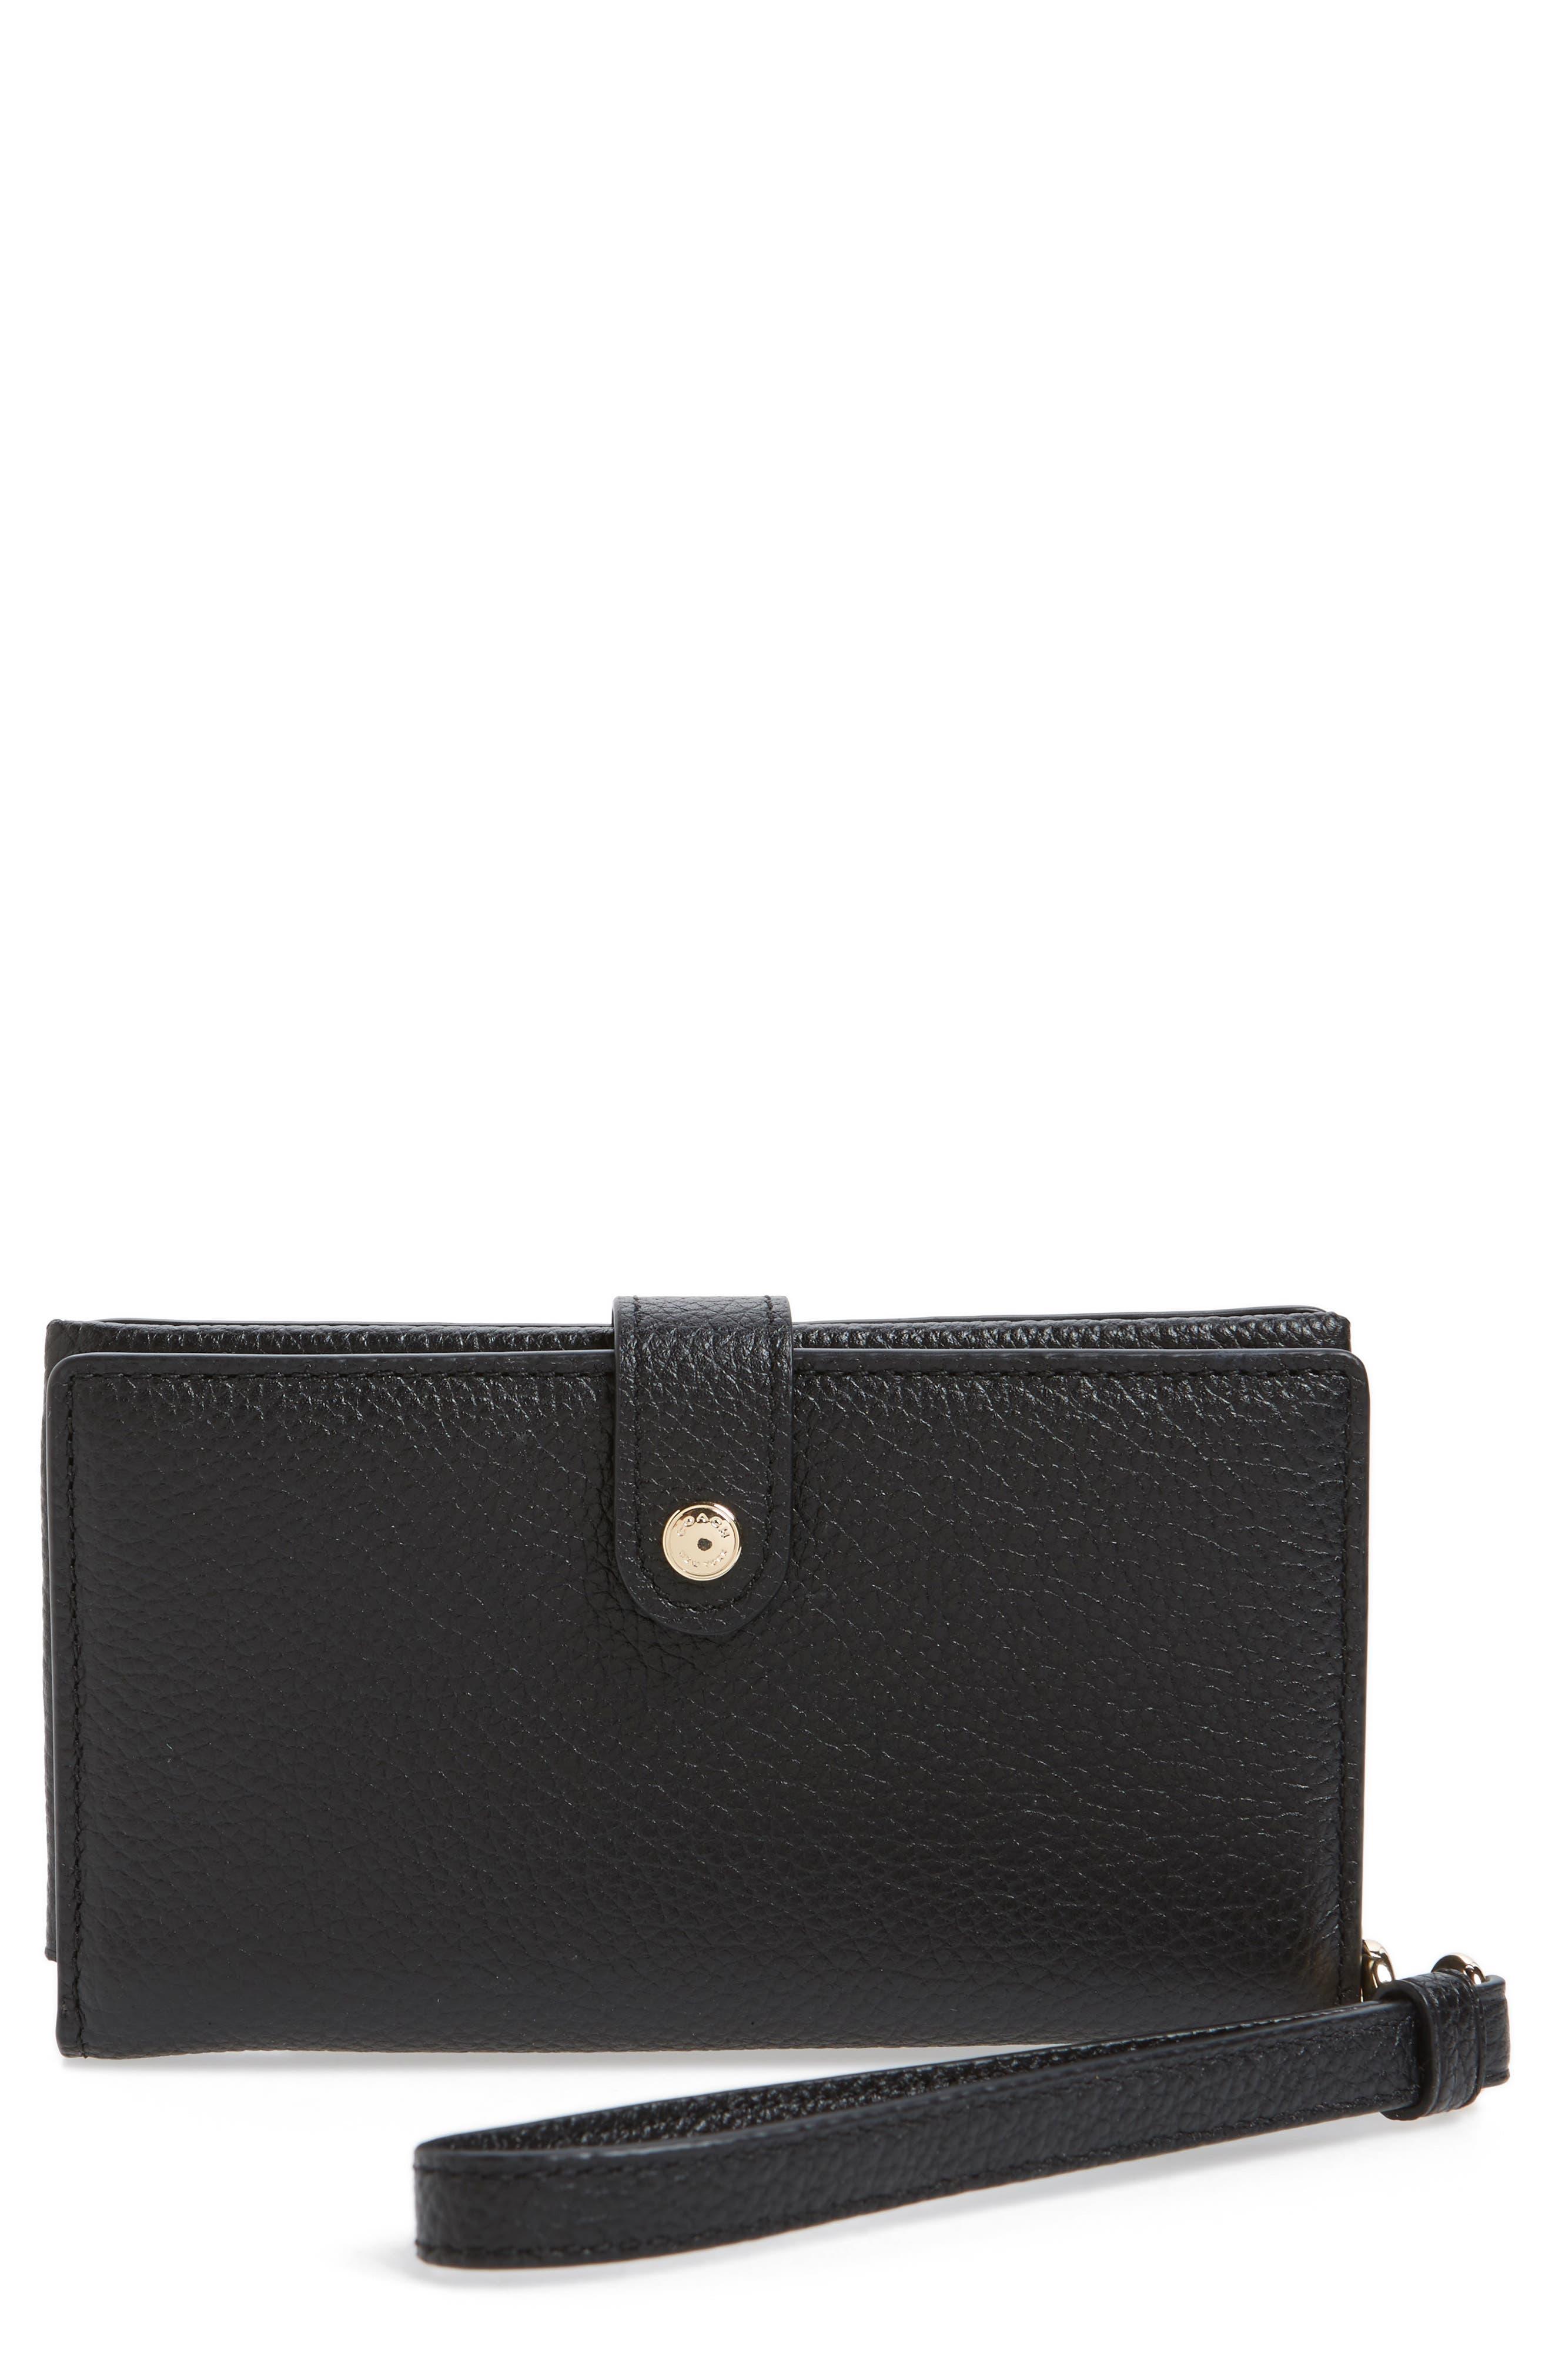 Calfskin Leather Phone Wristlet,                         Main,                         color, Black